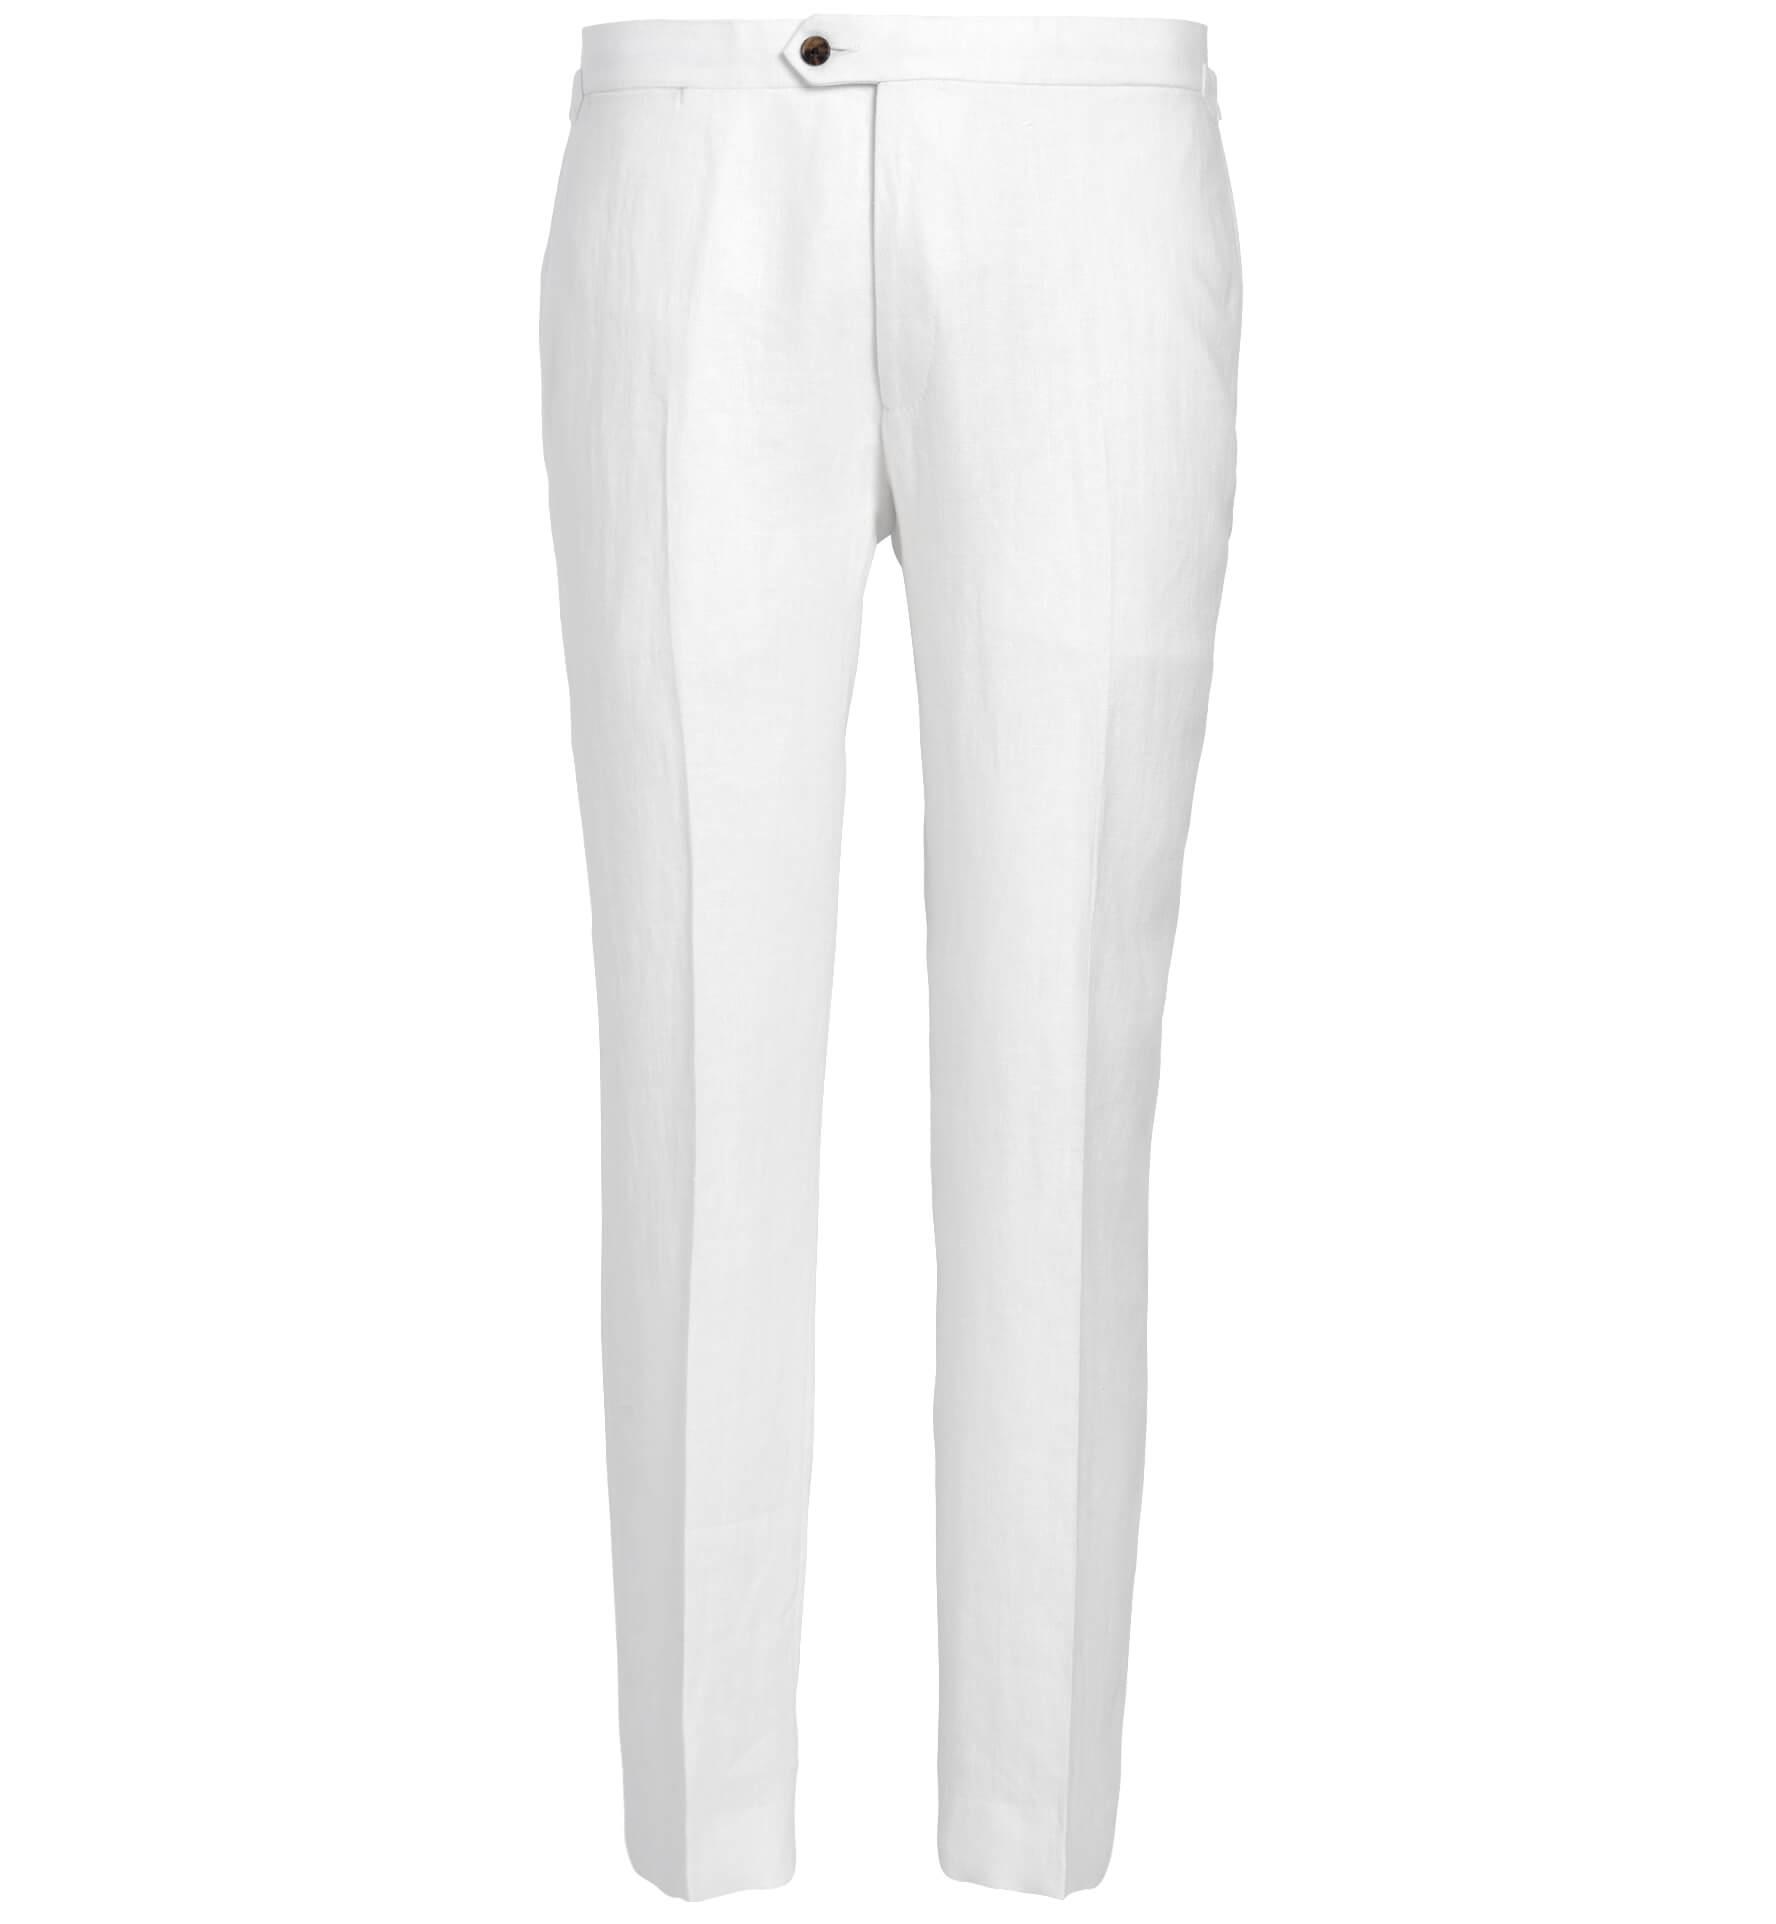 Zoom Image of Allen White Irish Linen Trouser